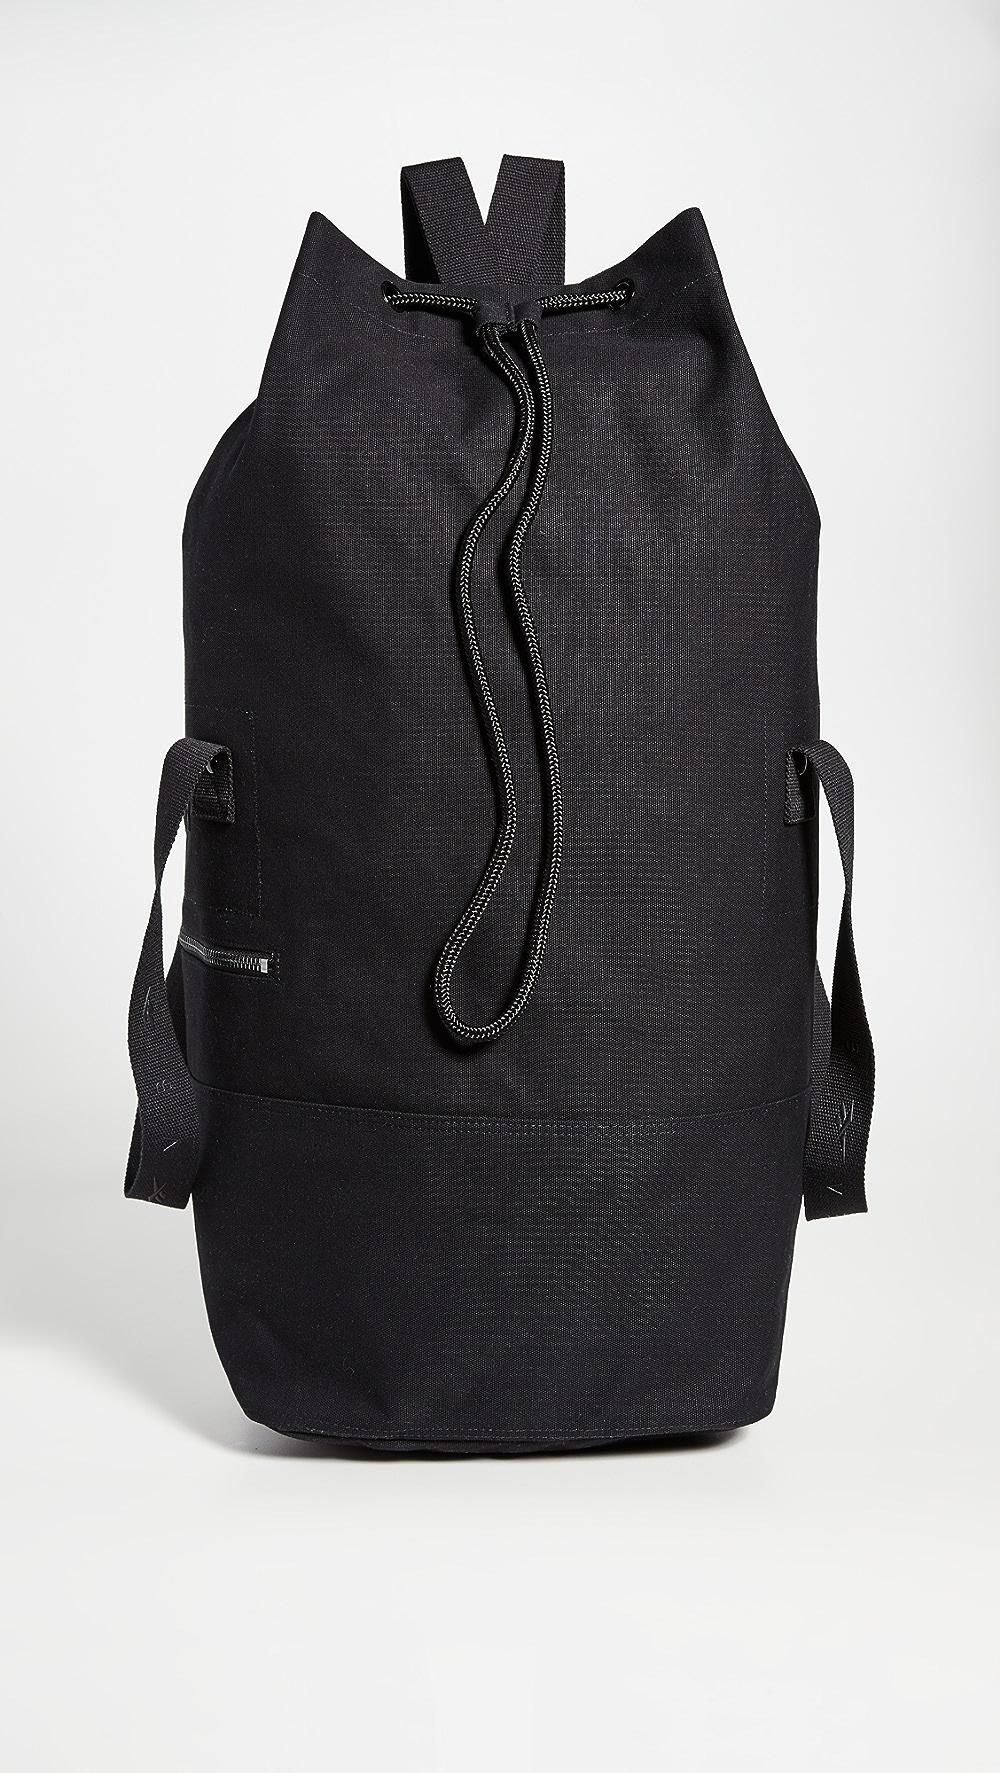 Analytical Reebok X Victoria Beckham - Rbk Vb Two Way Duffle Bag Discounts Price